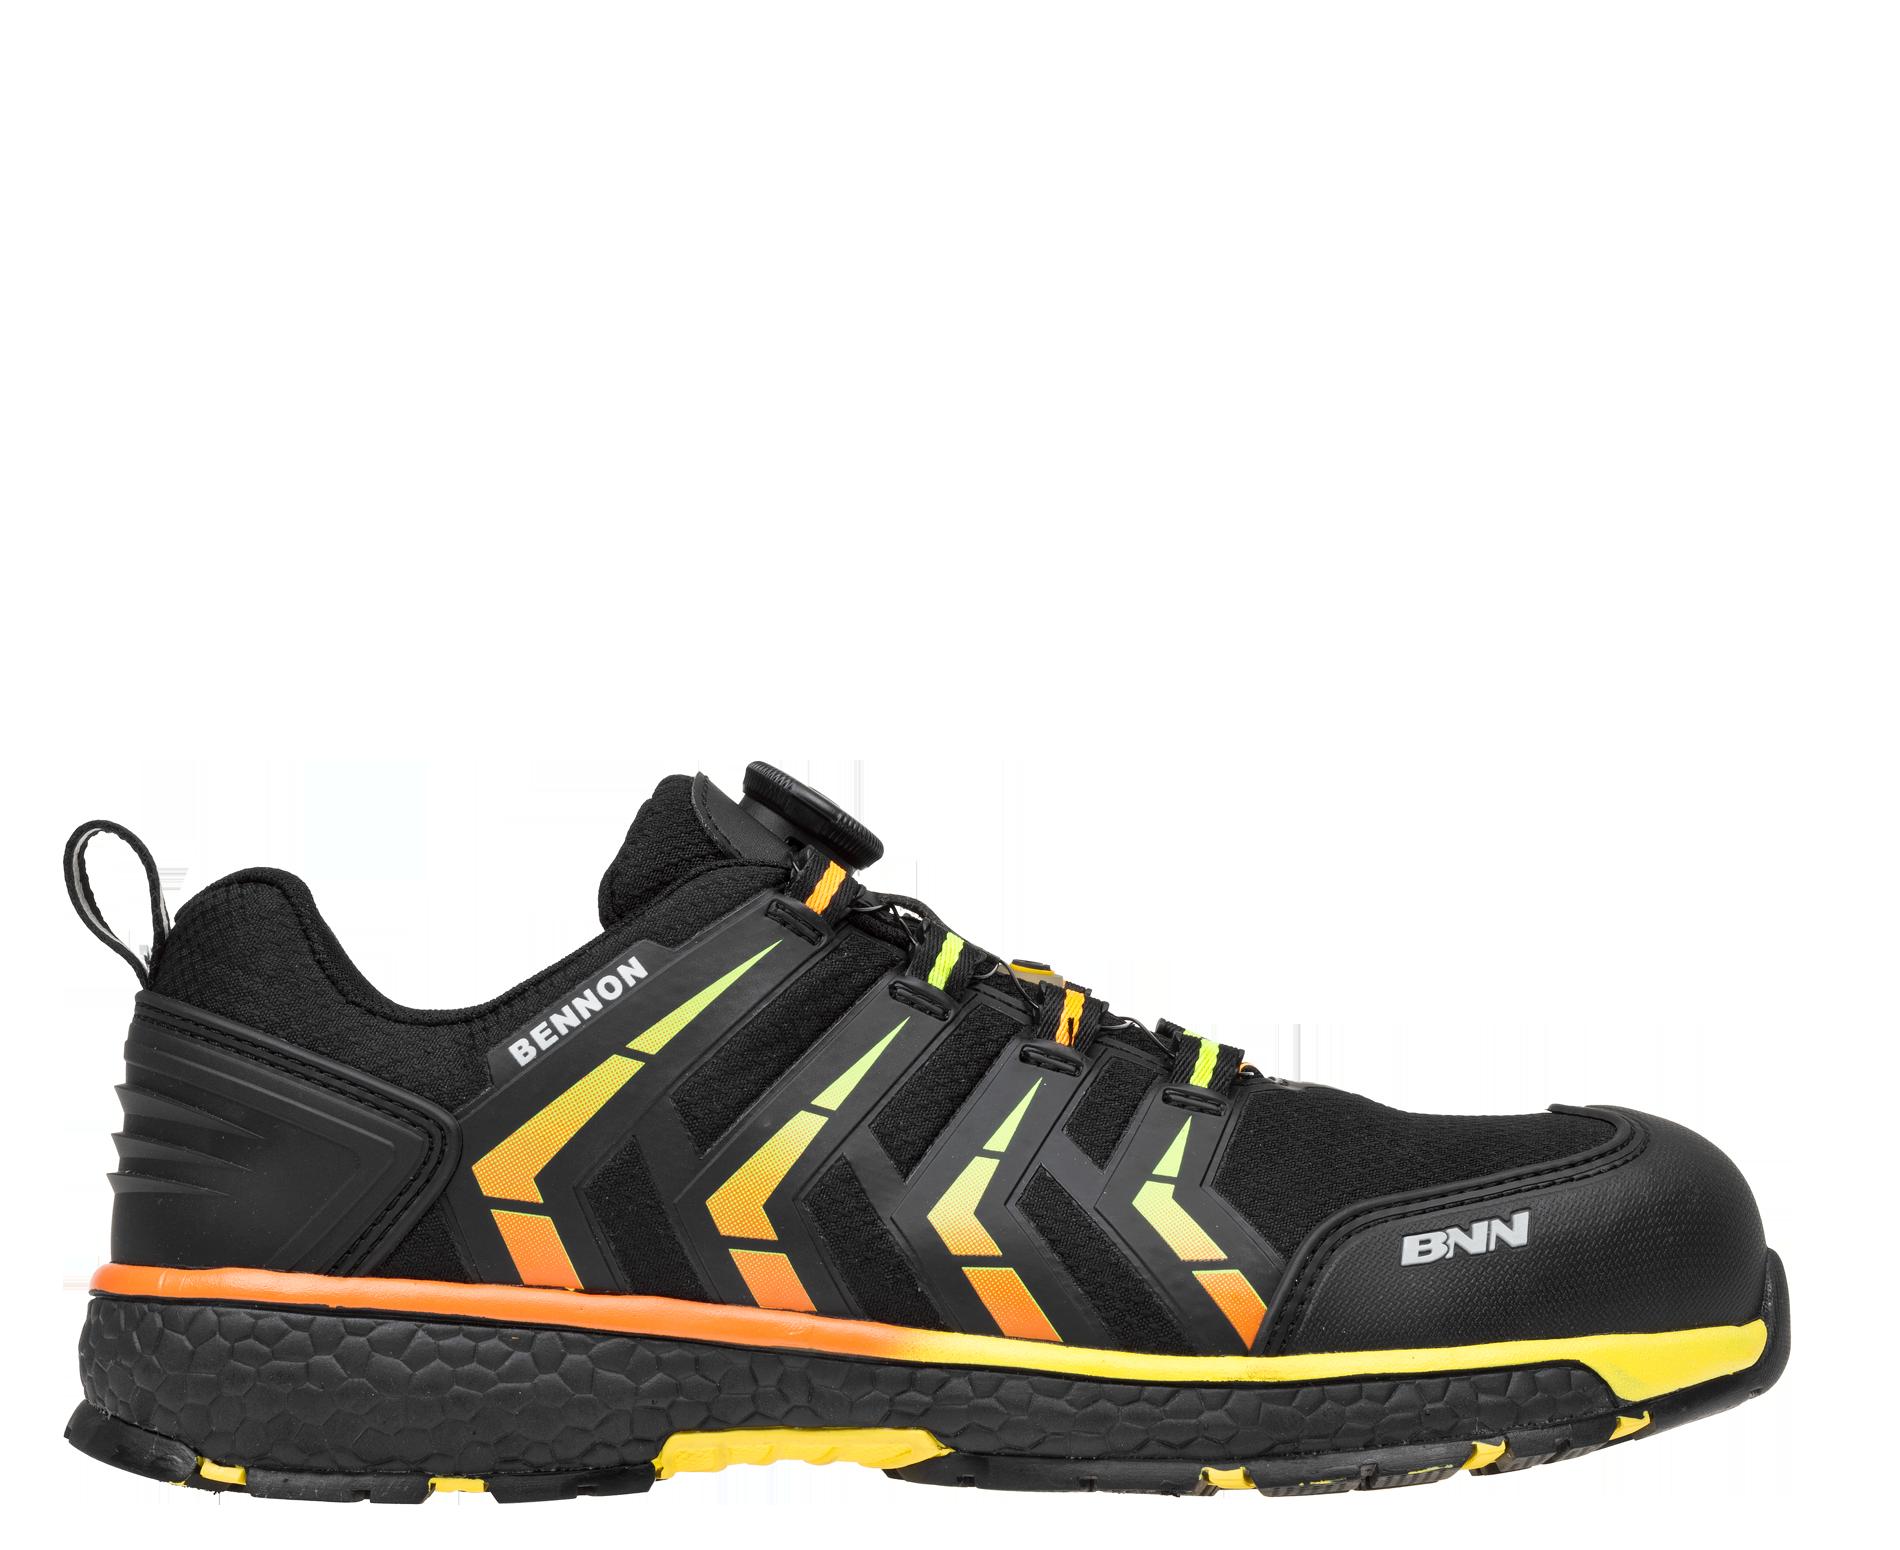 7c1fdd393 Bezpečnostná obuv BENNON STINGER S3 ESD ATOP Low - Cibex